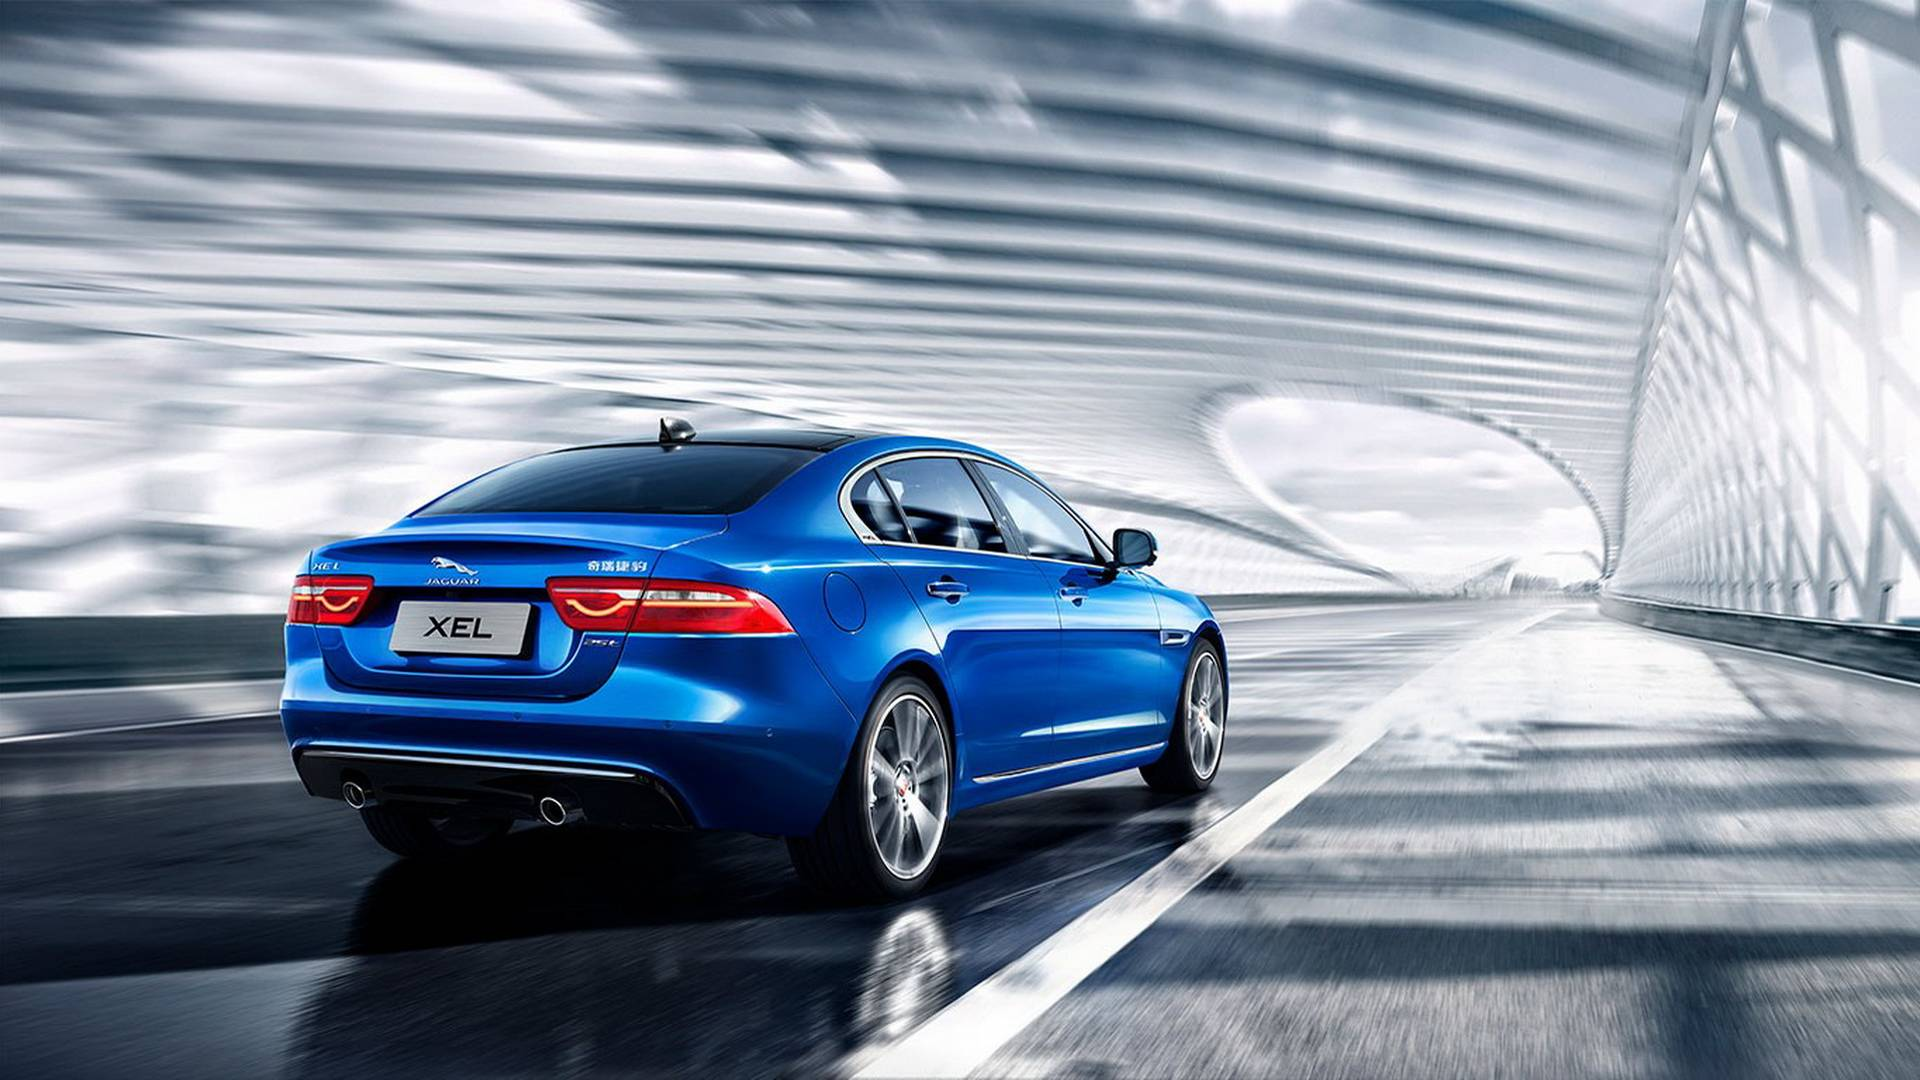 Jaguar XEL Fully Revealed For China With Elongated Wheelbase